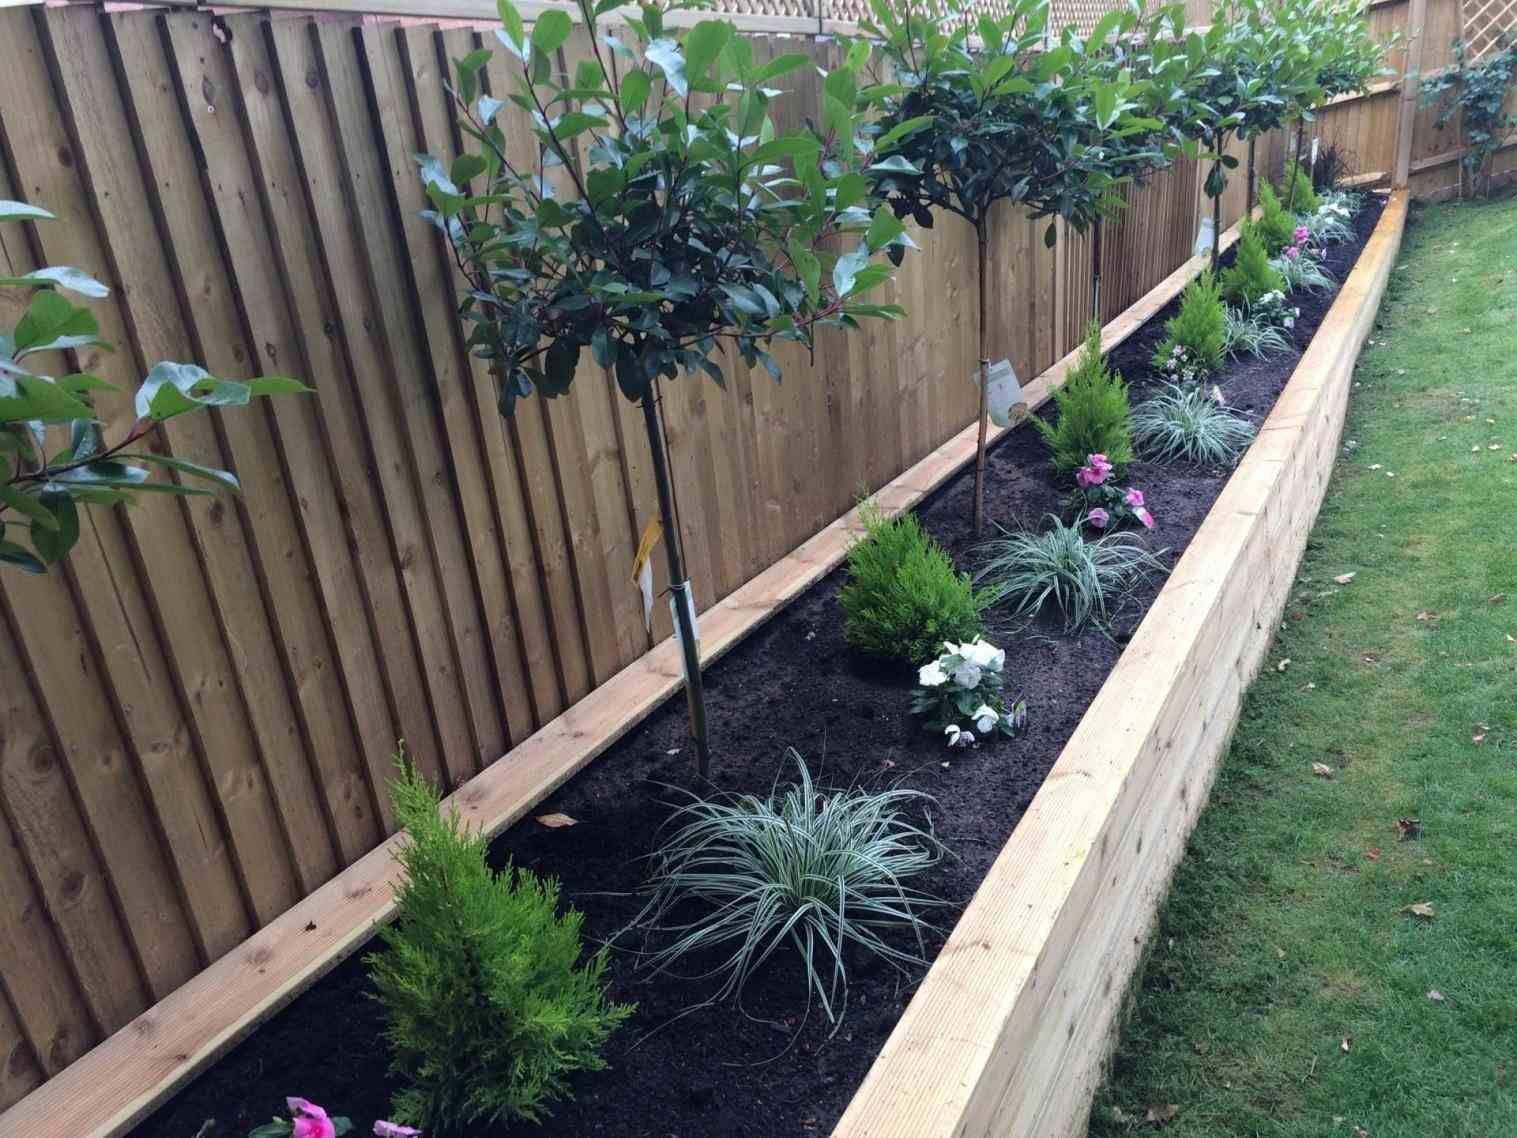 Raised Raised Garden Bed Along Fence Flower Beduthis Would Look So Much Better T Raised Raised Garden B Diy Garden Fence Wooden Garden Edging Easy Garden